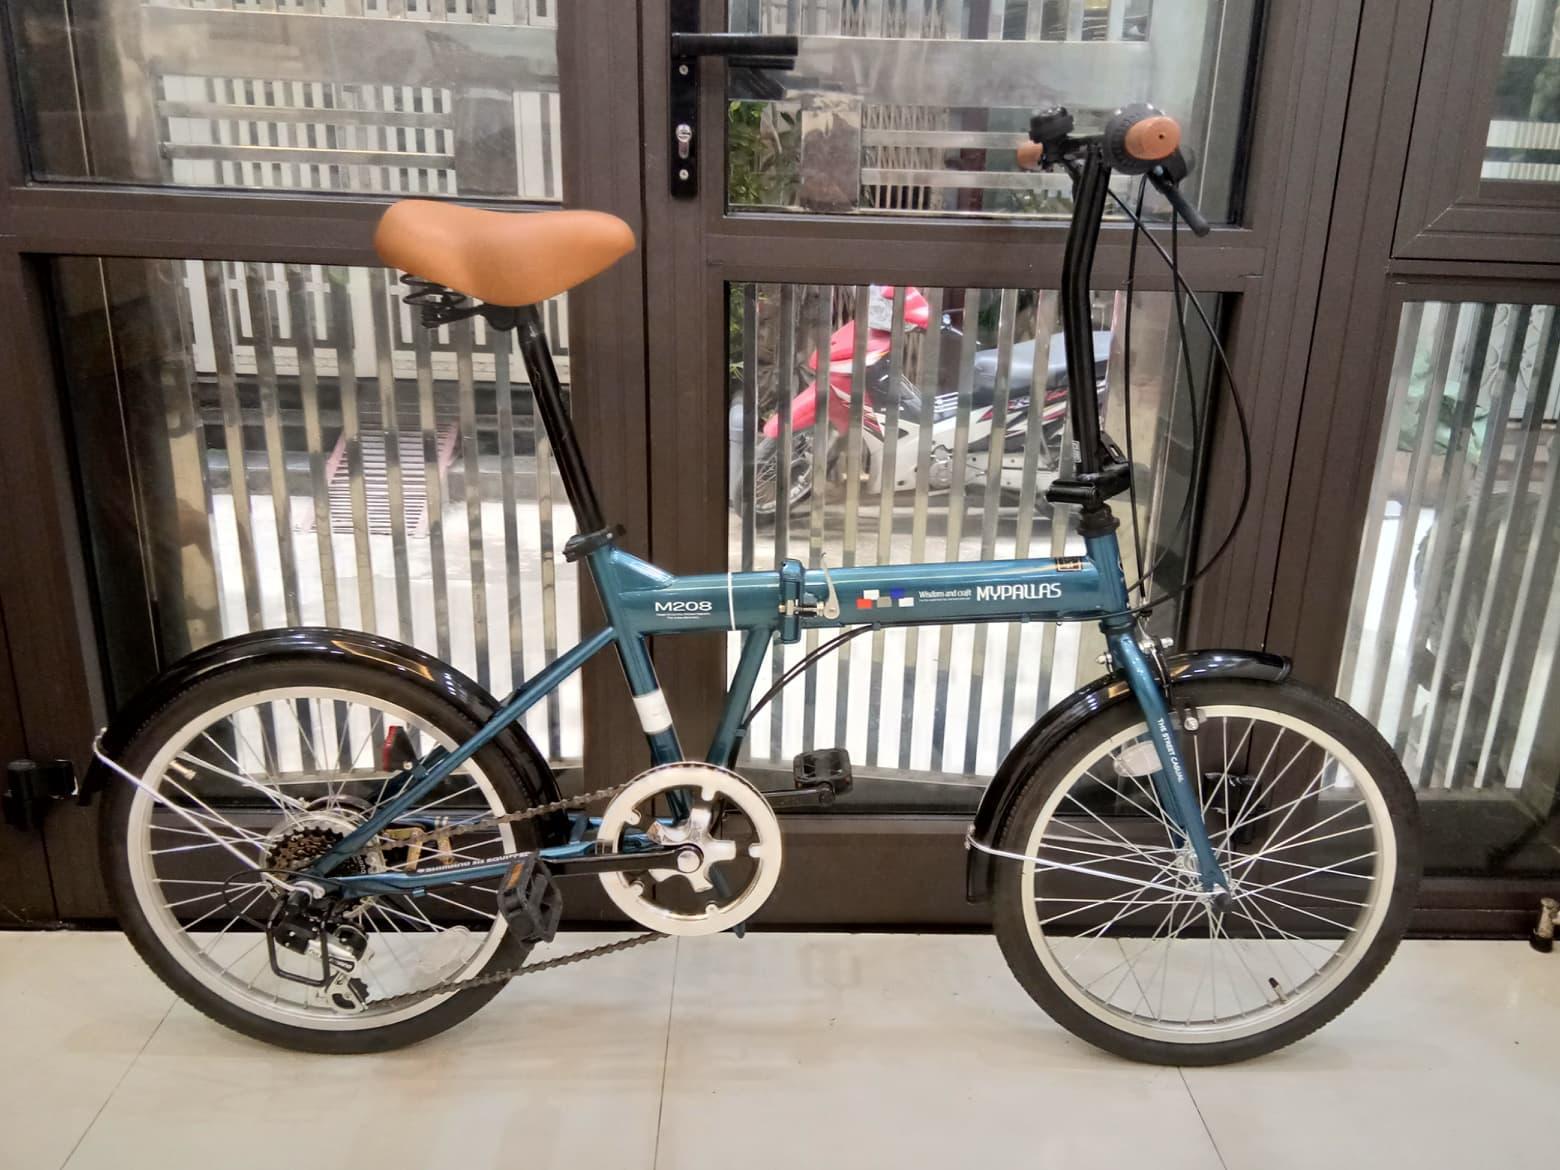 Mua Xe đạp gấp MYPALLAS M208